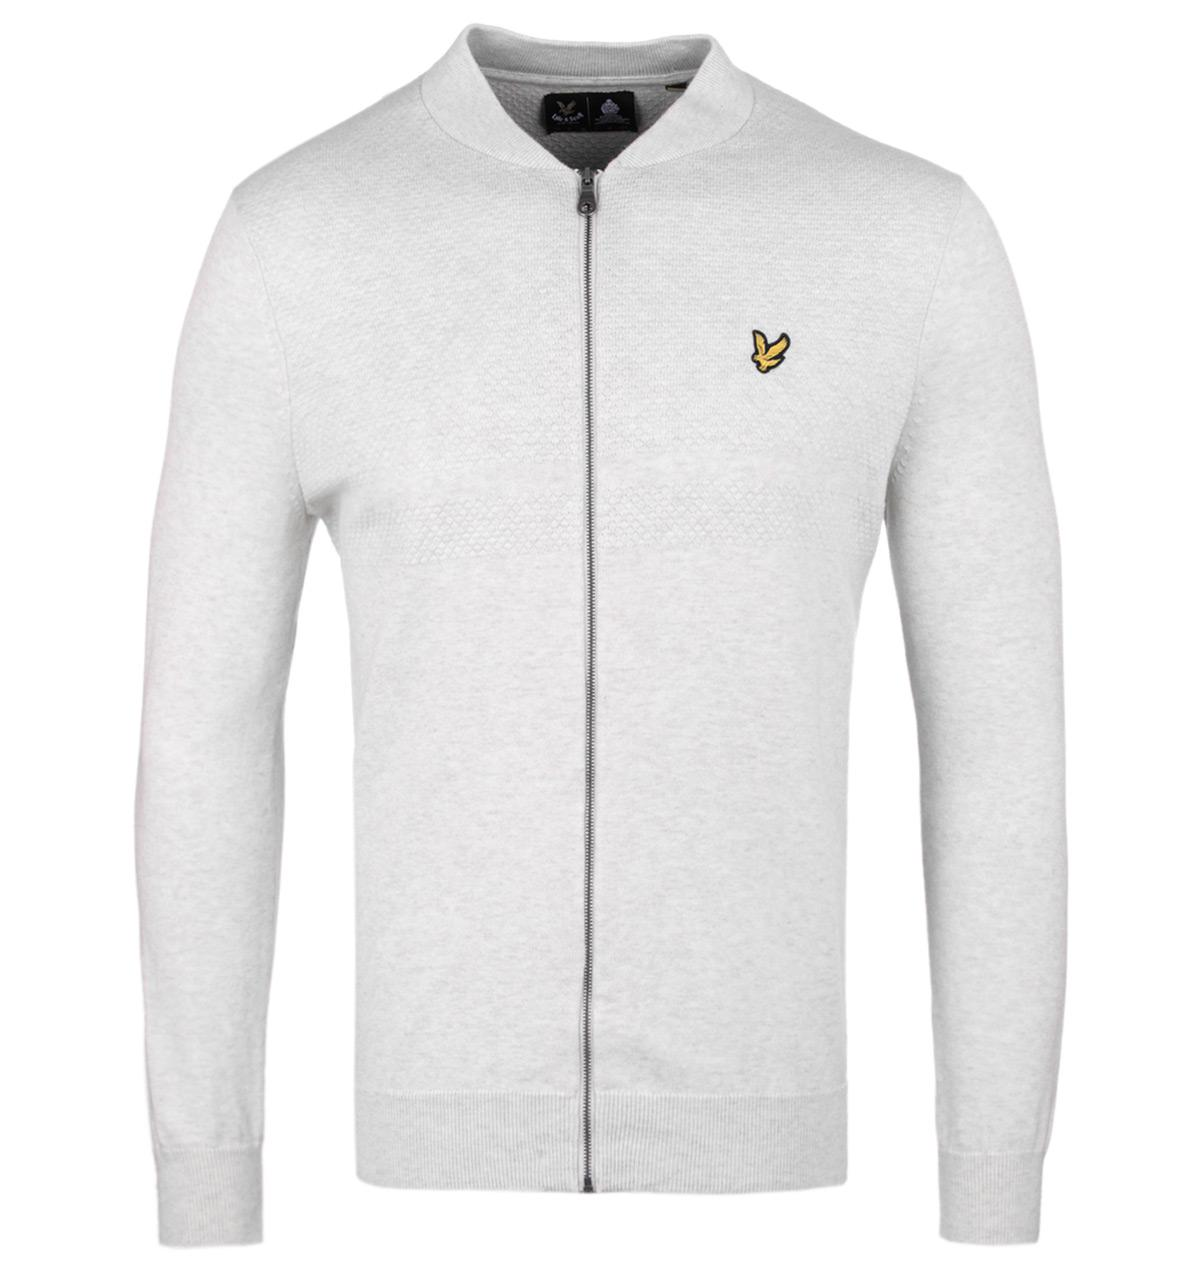 Lyle & Scott. Men's Textured Yoke Off White Marl Bomber Sweatshirt